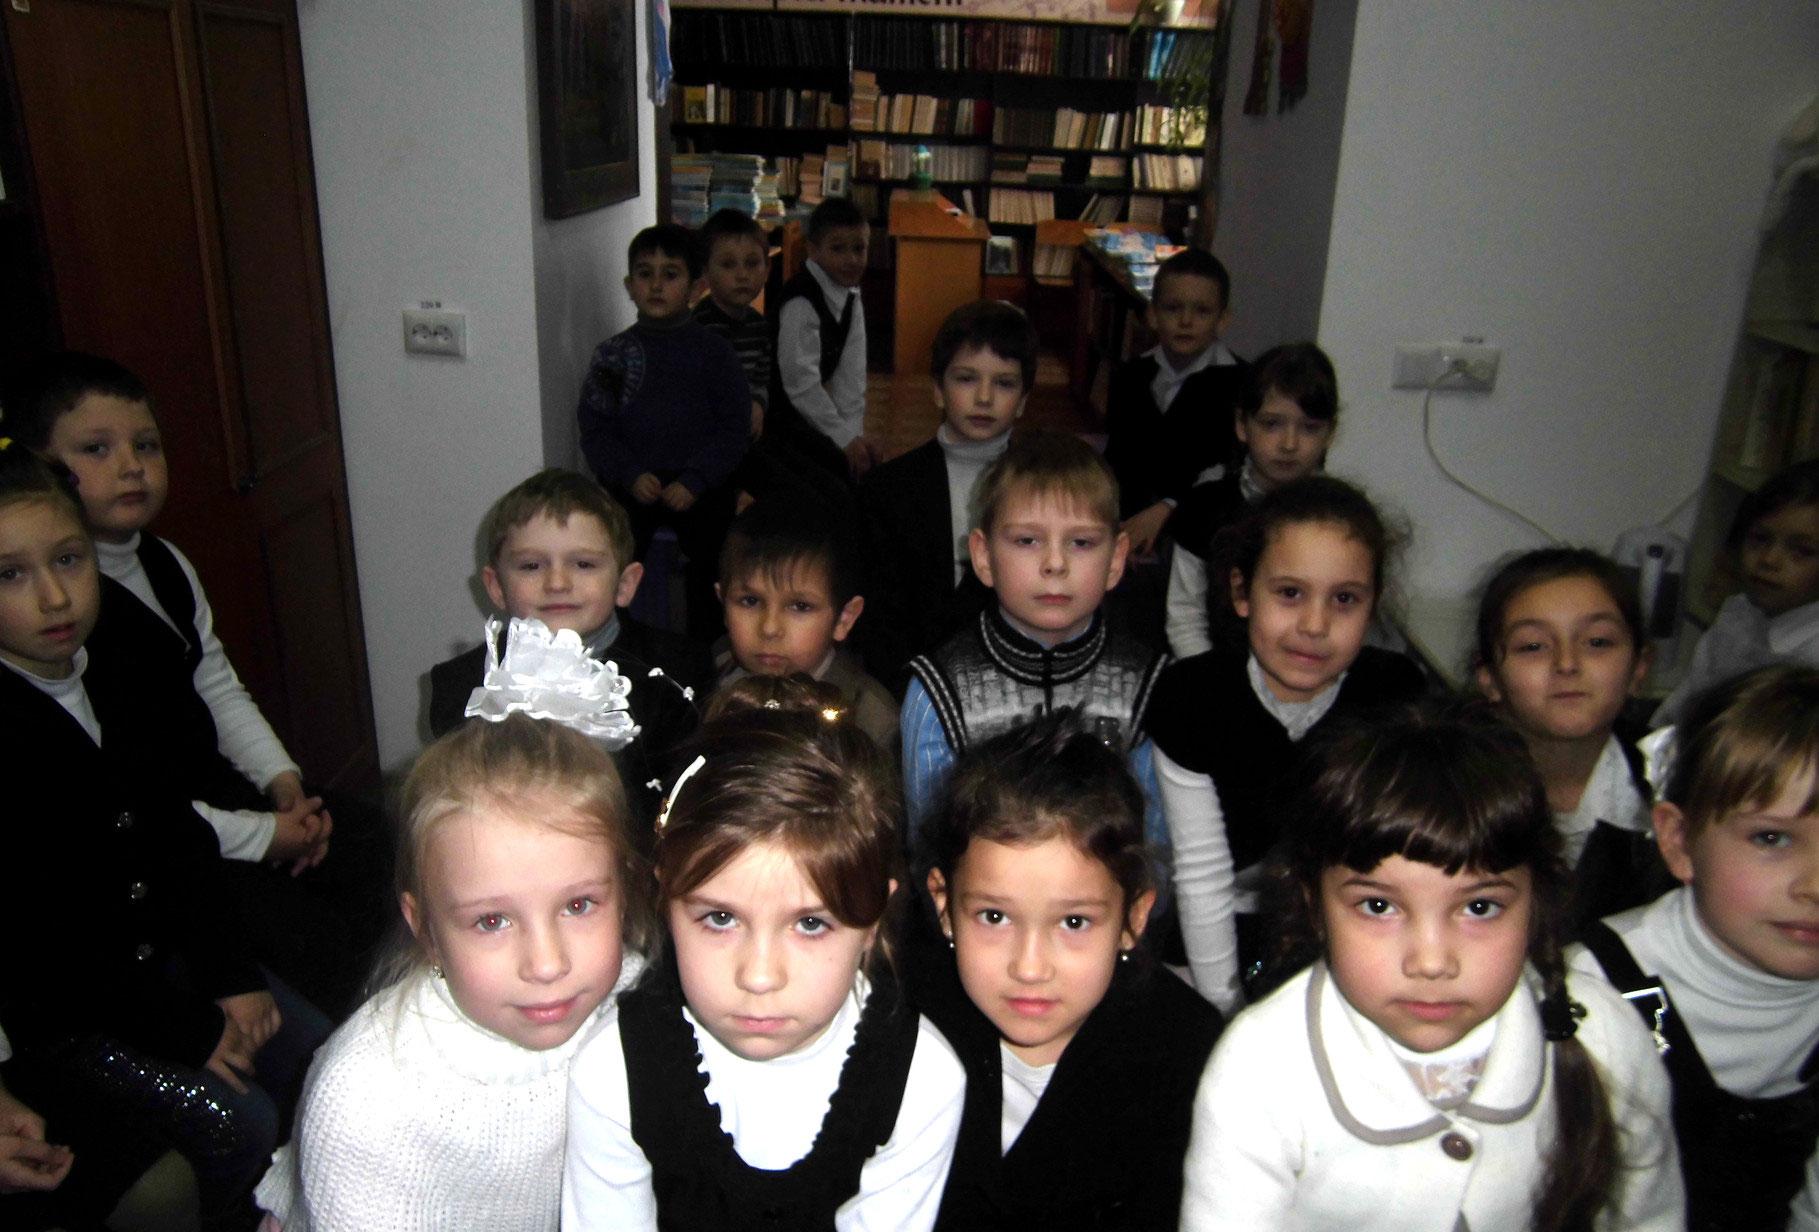 (c) Librarysudakschool1.jimdo.com